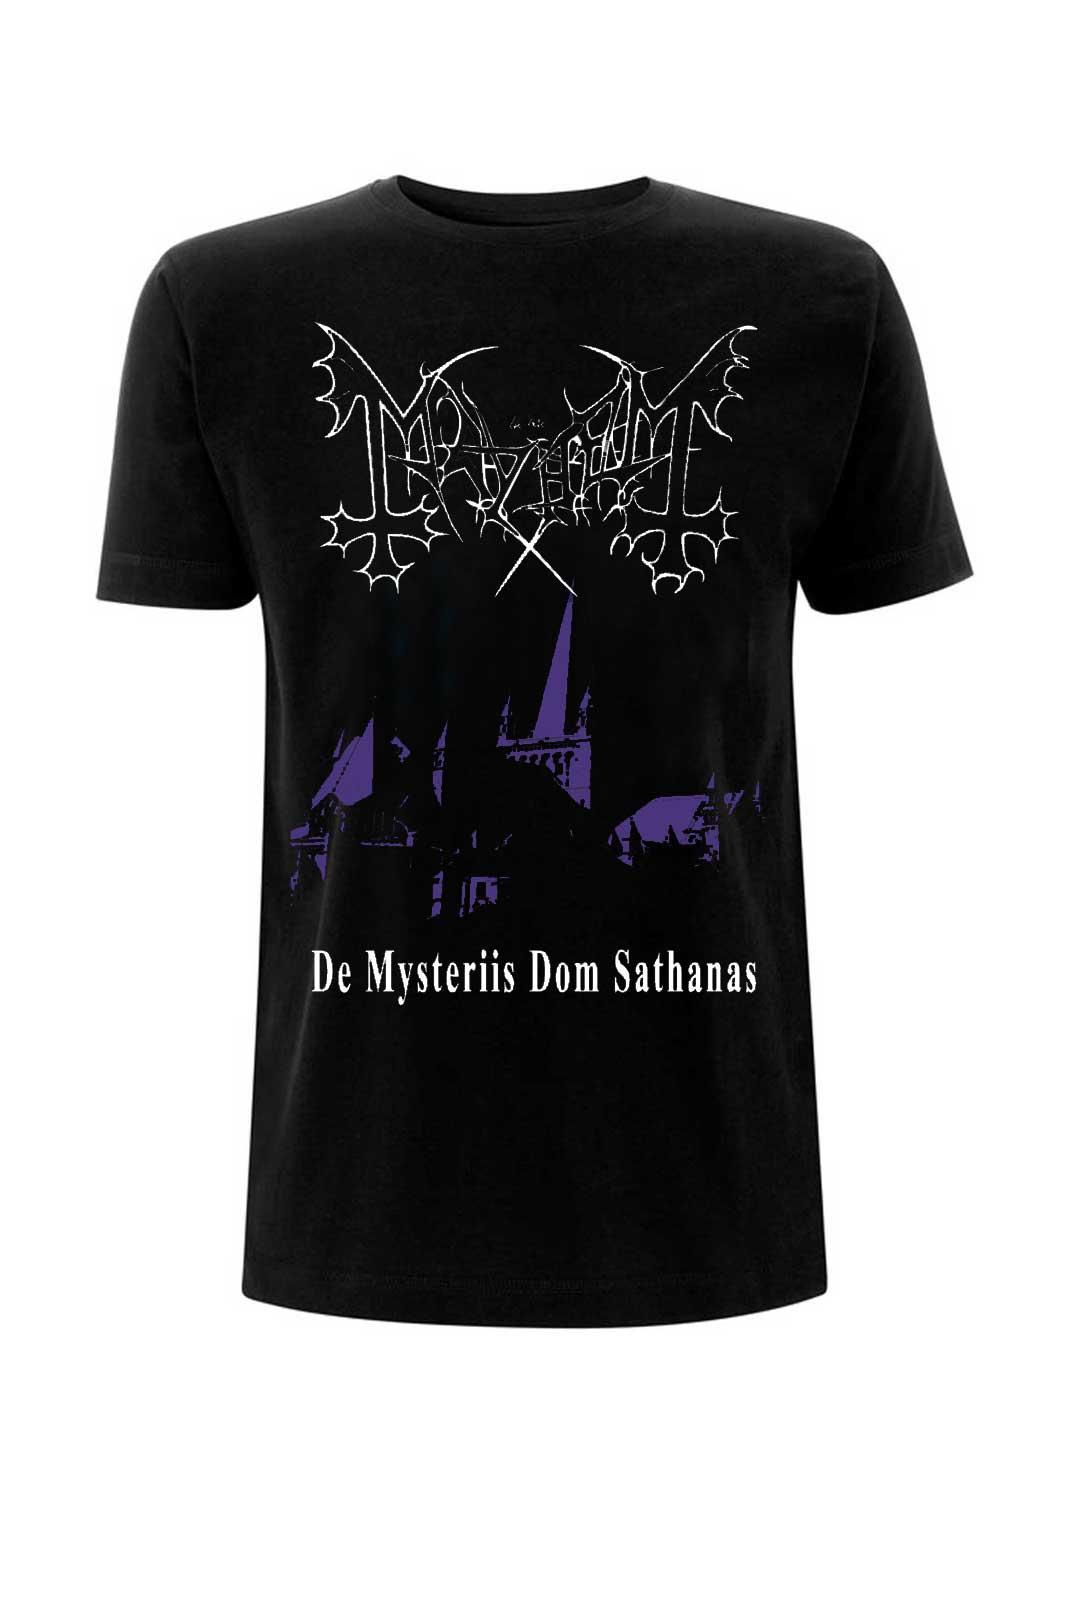 Mayhem De Mysteriis Dom Sathanas Tee Front